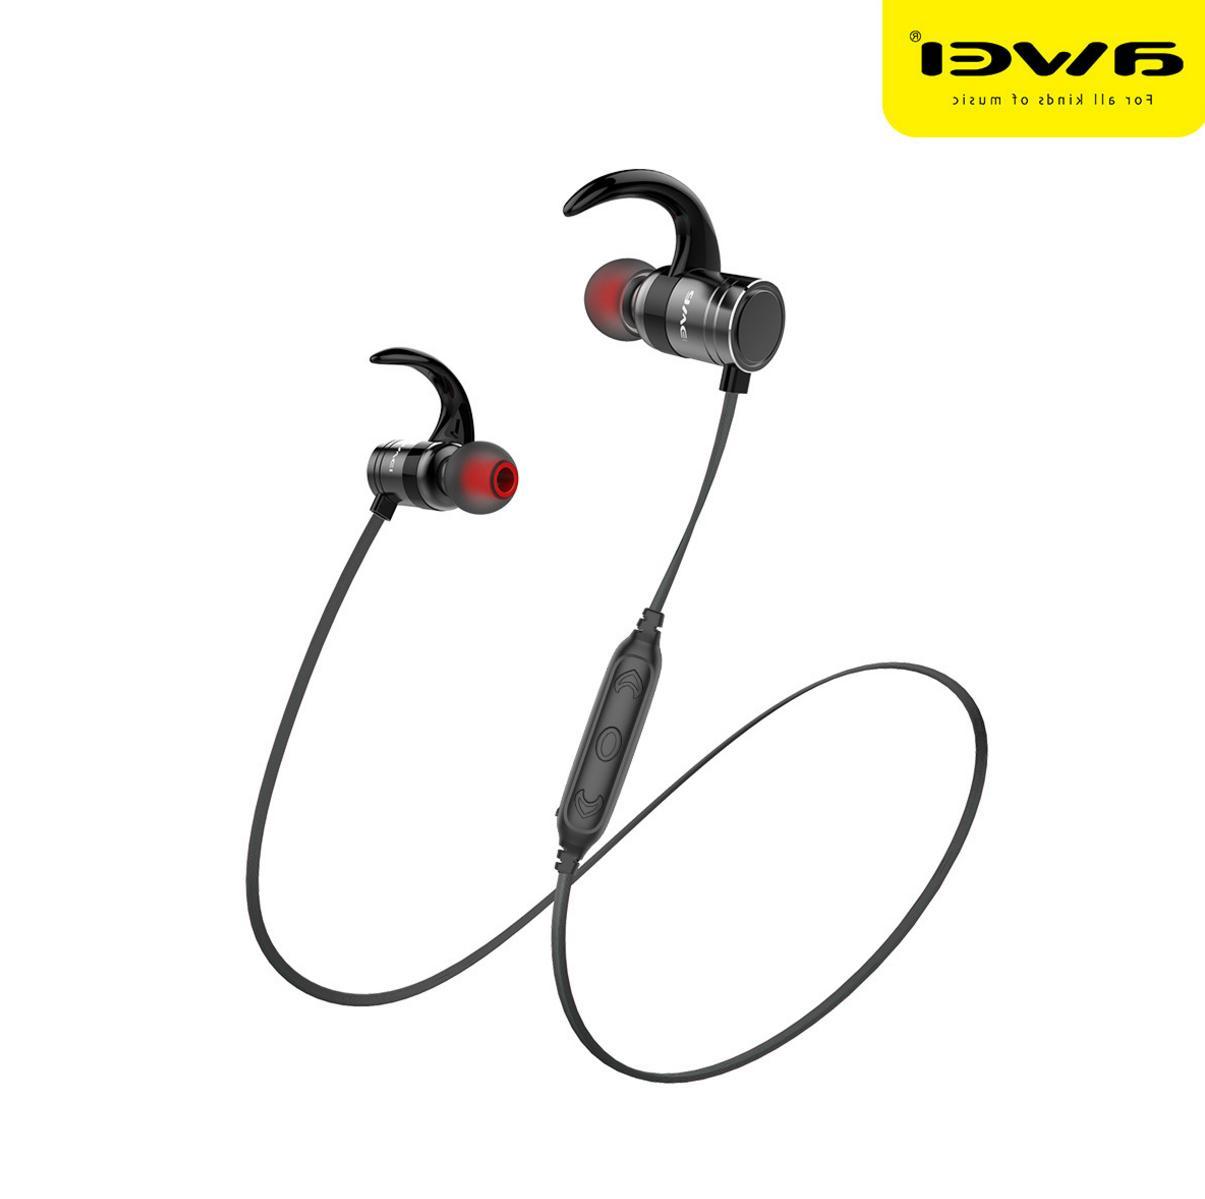 AWEI Bluetooth Stereo Earphones Sport